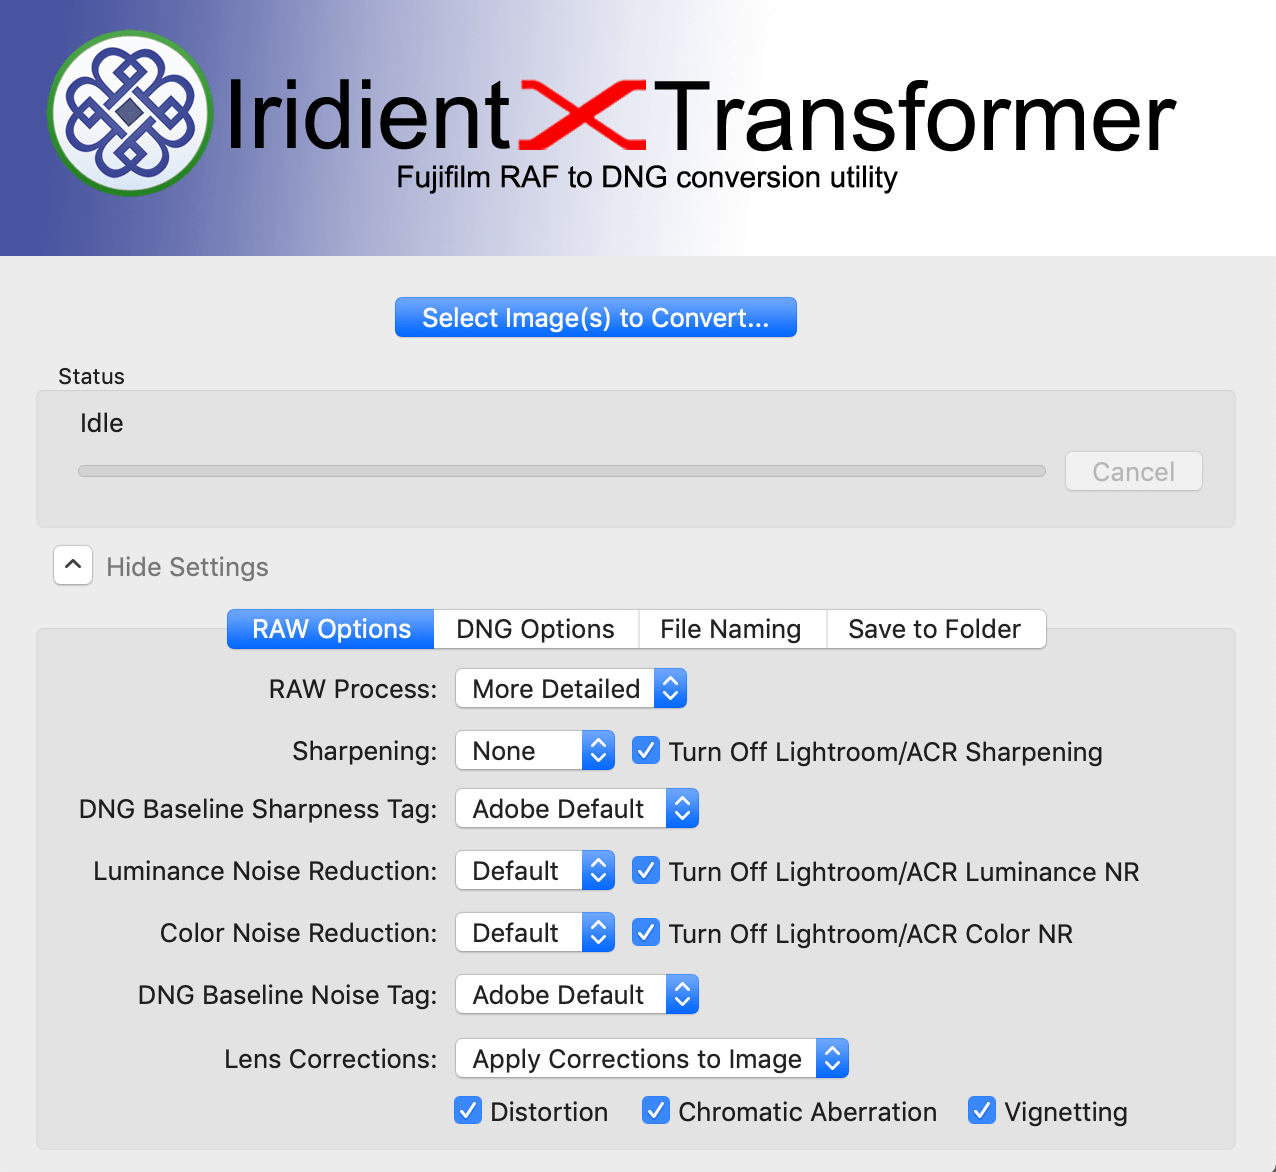 Iridient Transformer settings - screen 1